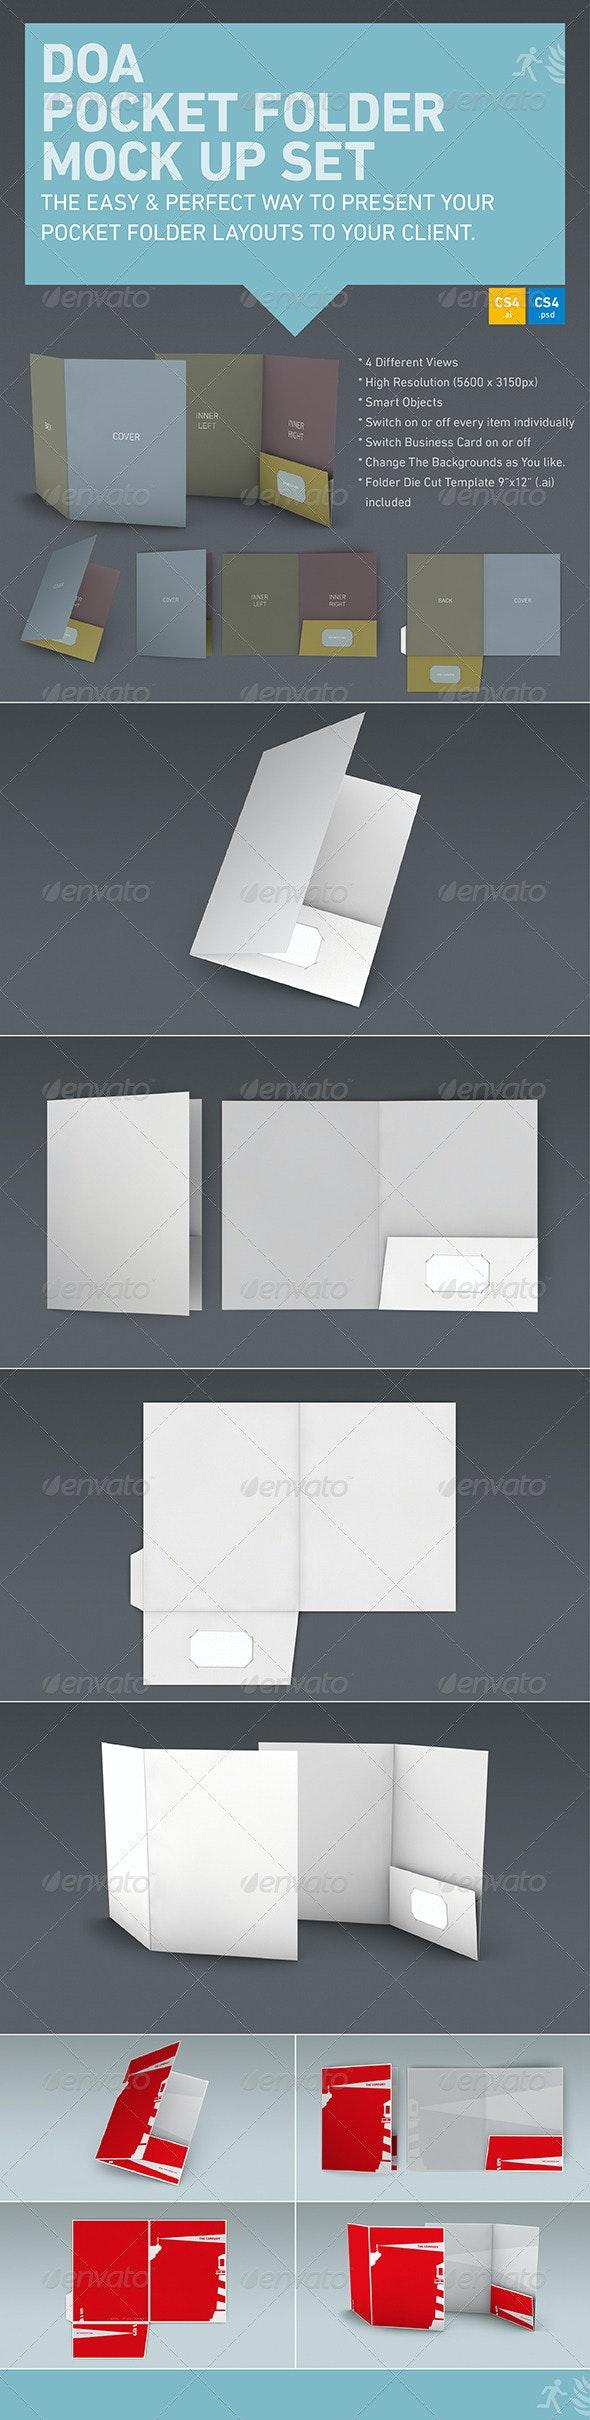 DOA Pocket Folder Mock Up Set - Stationery Print